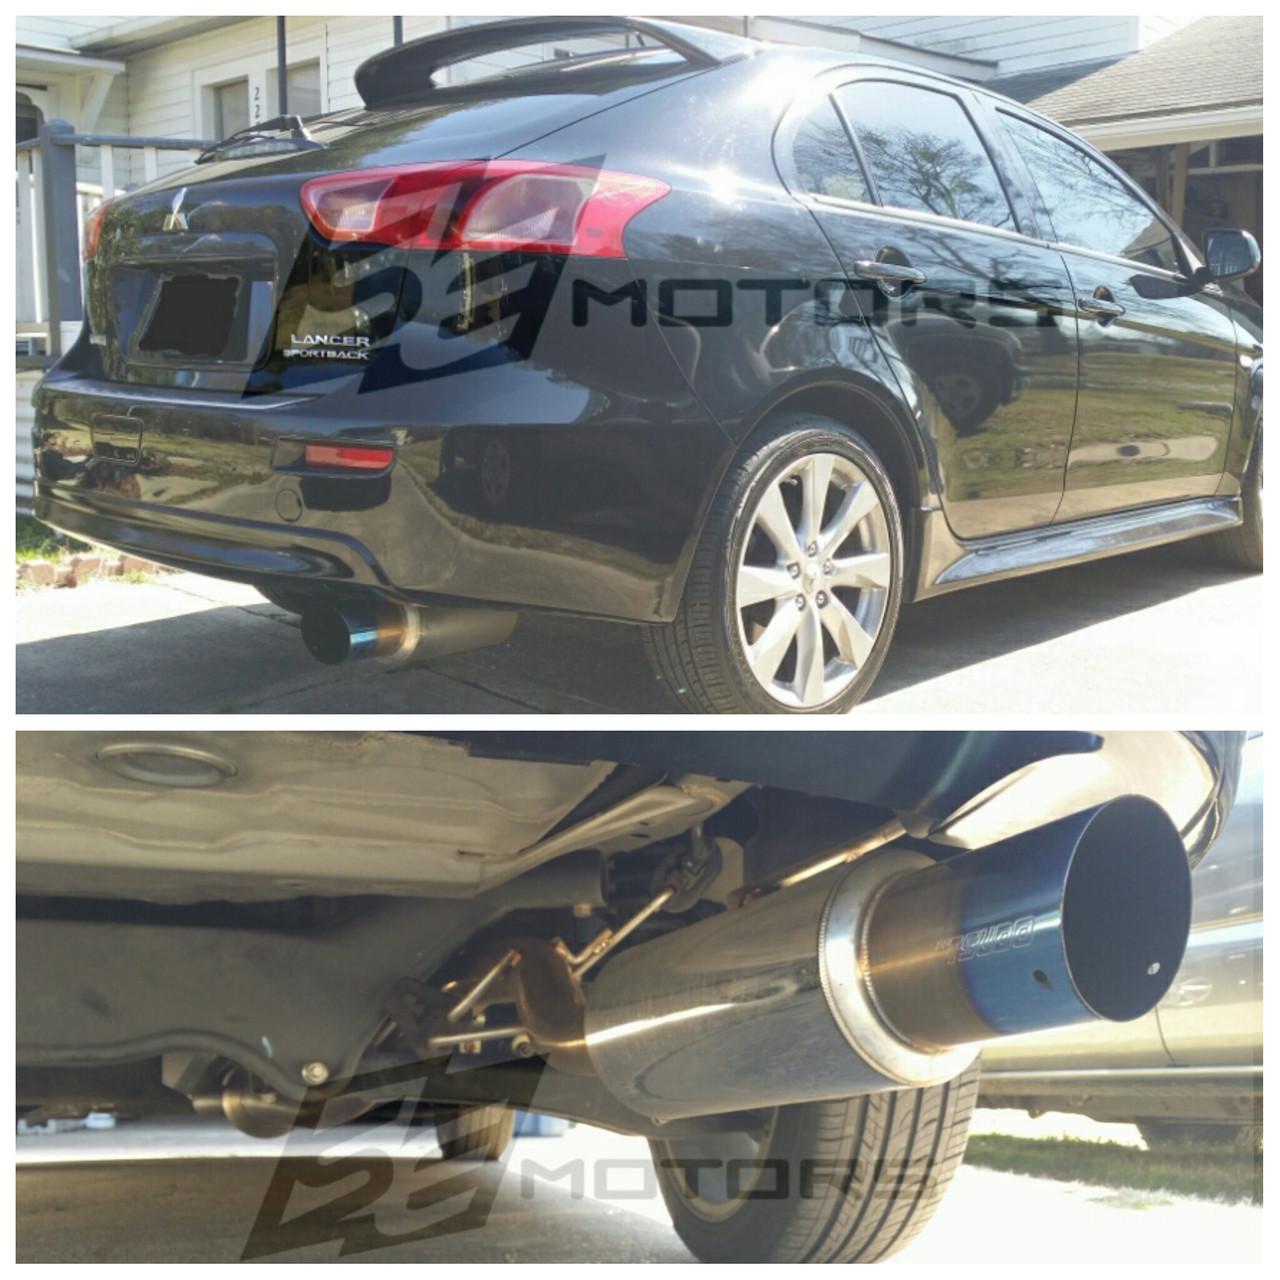 Tsudo 12-15 Mitsubishi Lancer SportsBack DE ES GT S2 Burnt Tip Axleback Exhaust (22-9201-A)